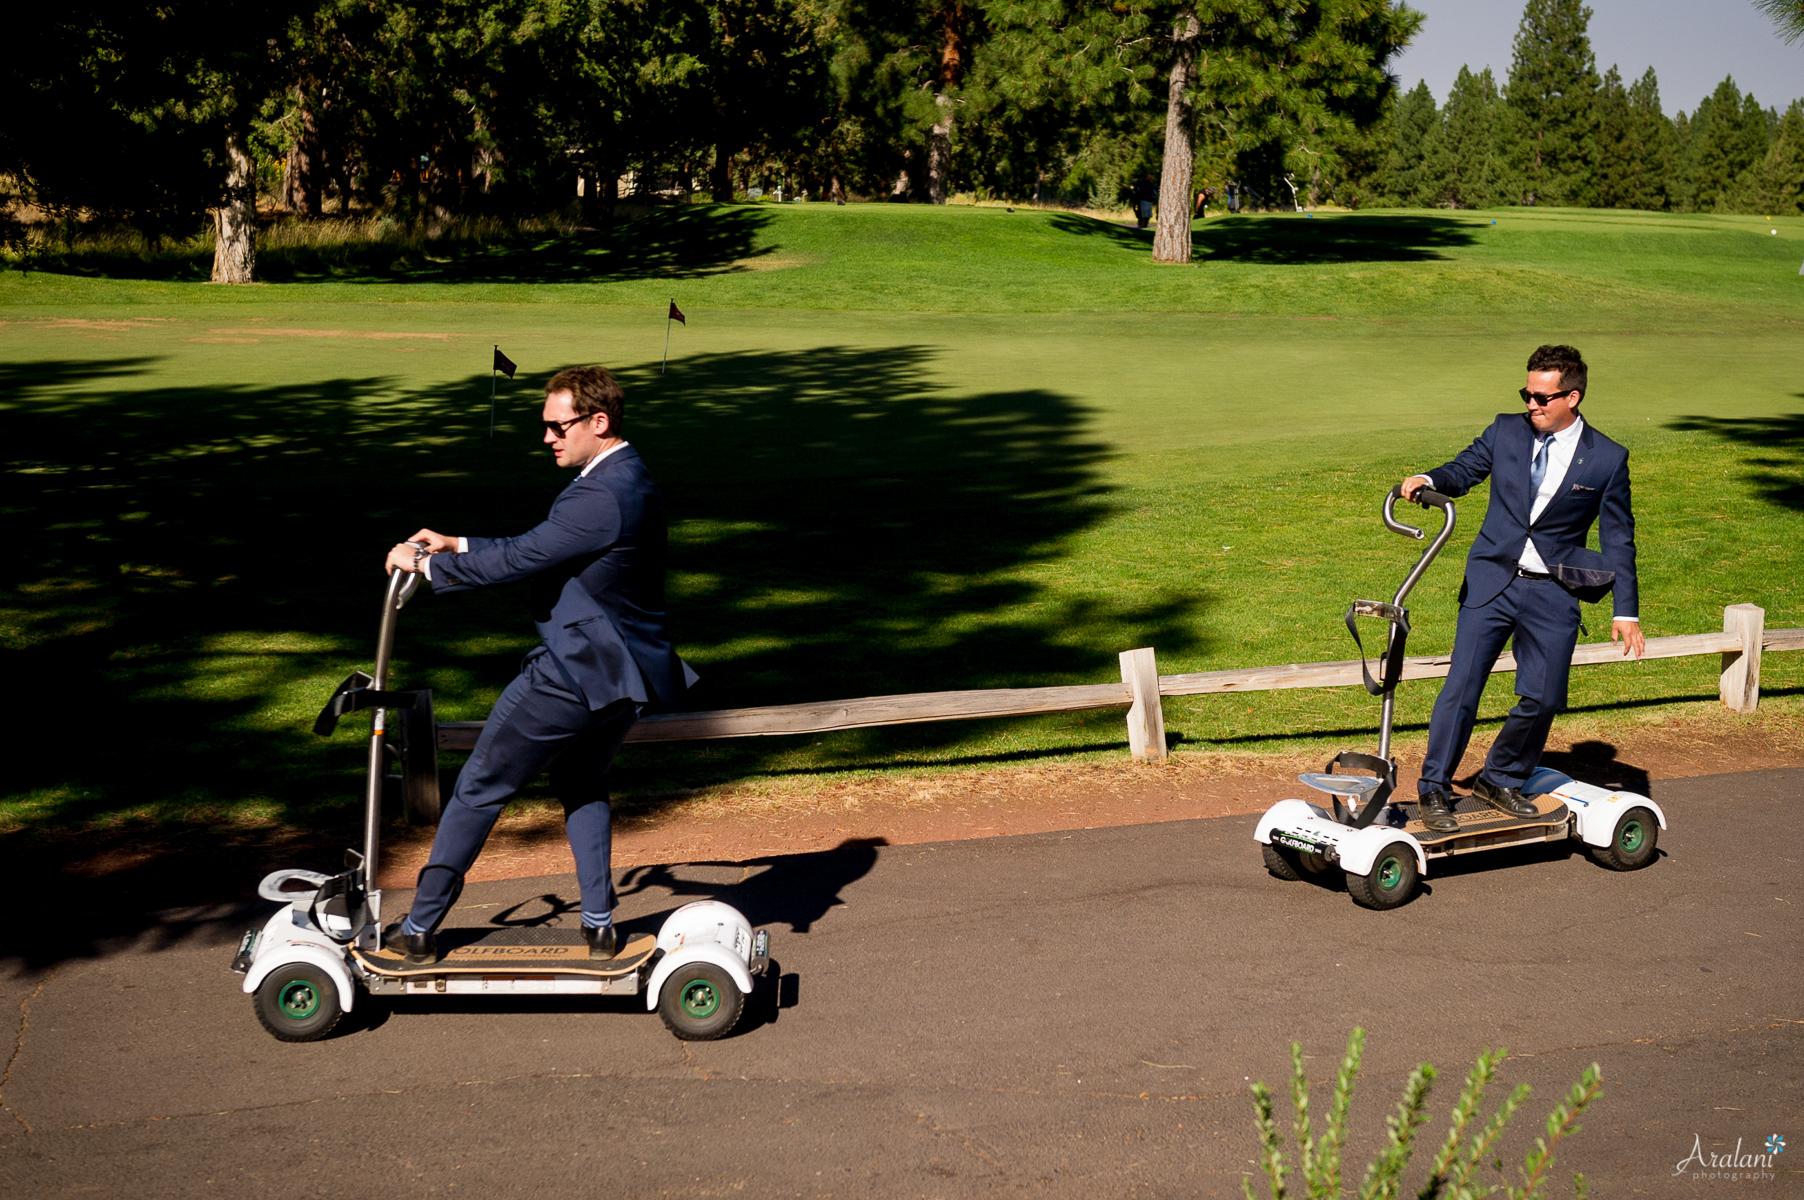 Aspen_Lakes_Golf_Course_Wedding_KG0015.jpg